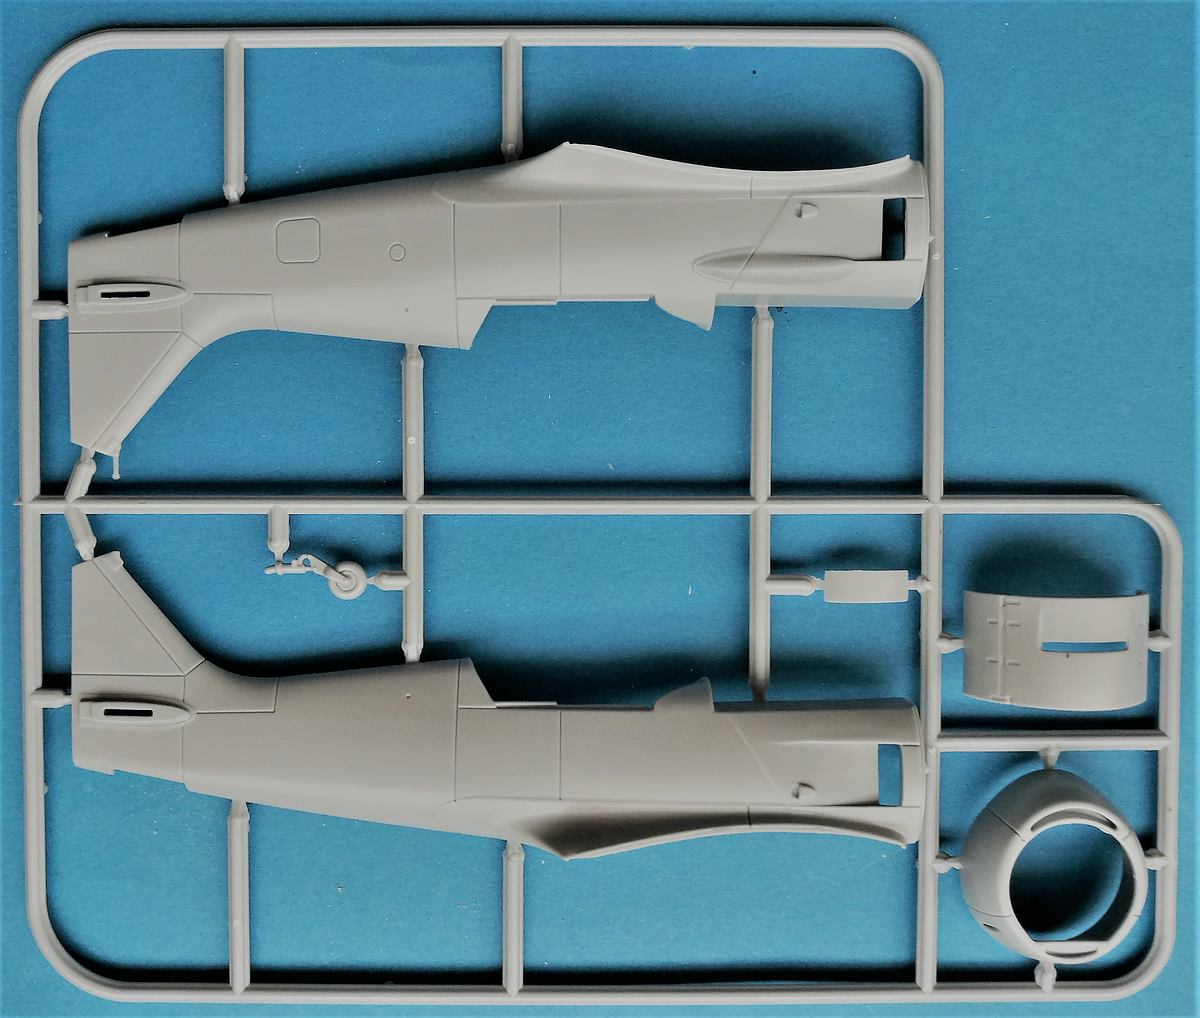 ARK-Models-AK-48050-Lavochkin-La-11-6 Lavochkin La-11 in 1:48 von ARK Models #AK 48050